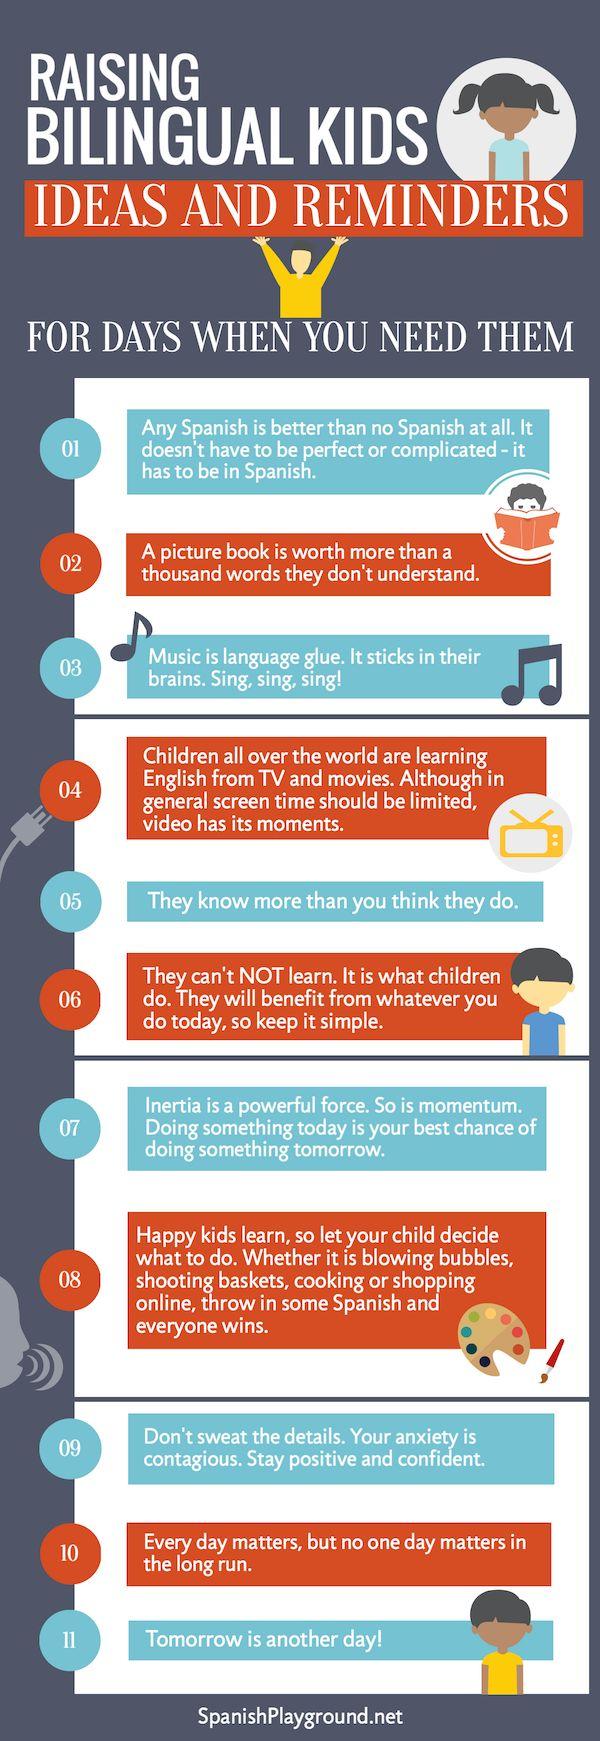 Raising bilingual kids? 11 truths to keep in mind on the hard days. http://www.spanishplayground.net/teaching-kids-spanish-hard-days/ … #langchat